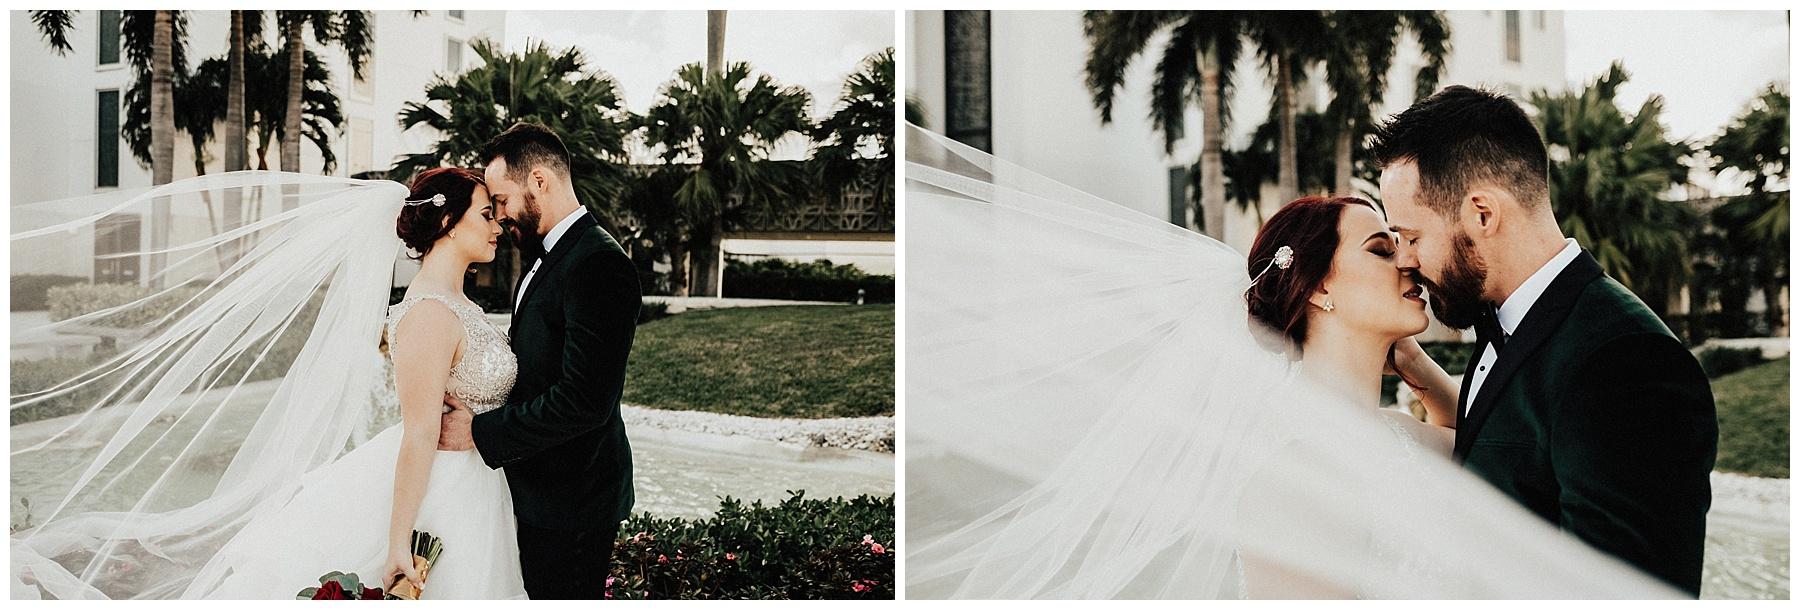 Fort Lauderdale Wedding Tampa Wedding Photographer-71.jpg